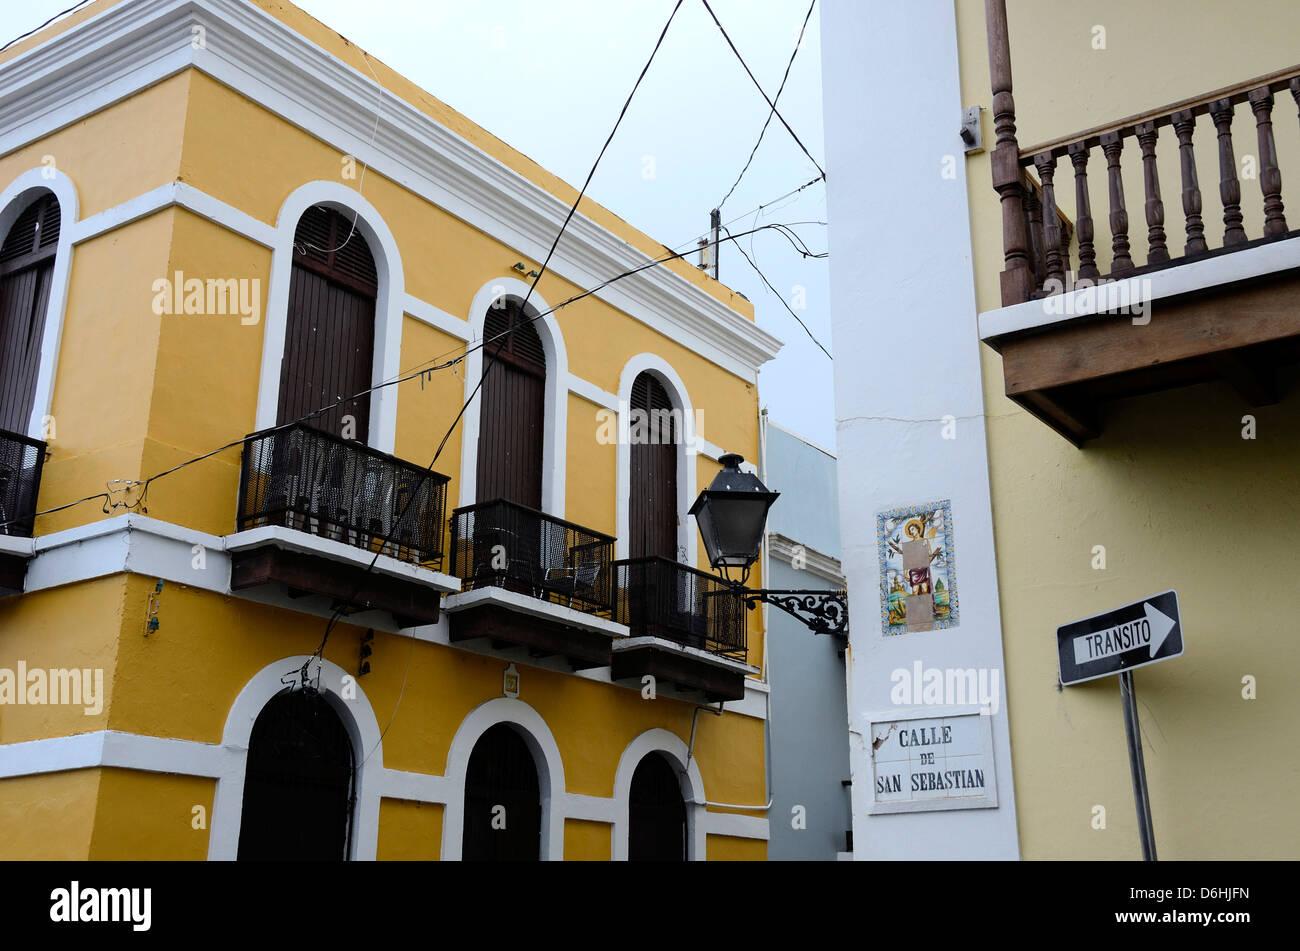 Yellow building in Old San Juan, Puerto Rico - Stock Image